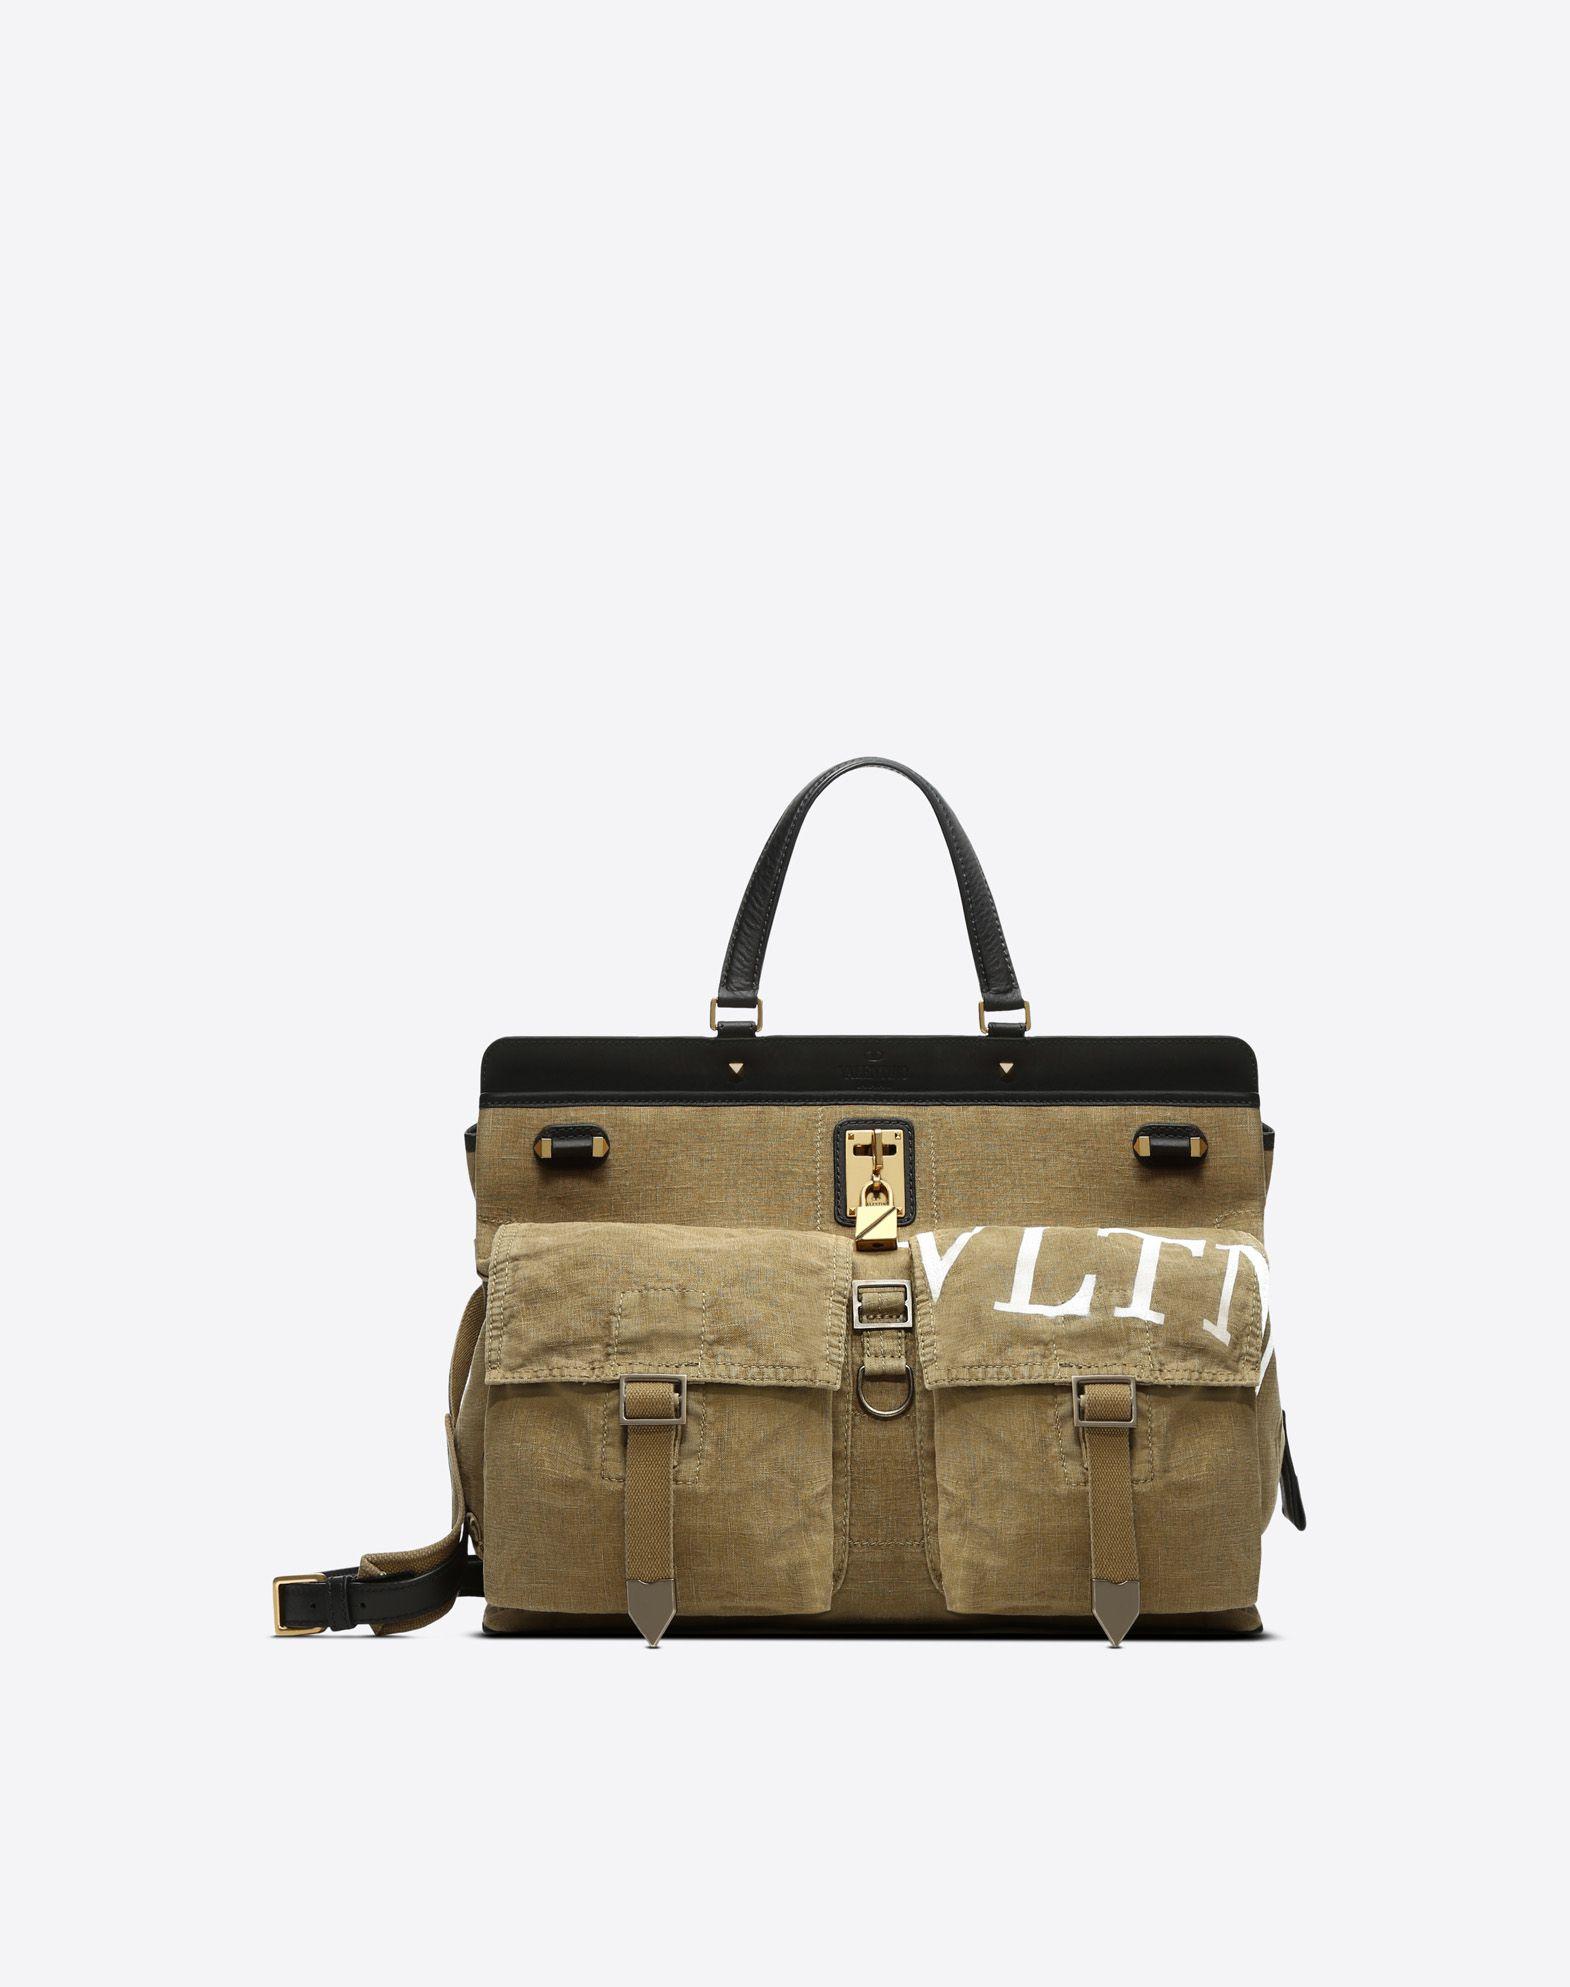 VALENTINO Plain weave Logo Solid colour Framed closure Handbags Medium  45397396iw